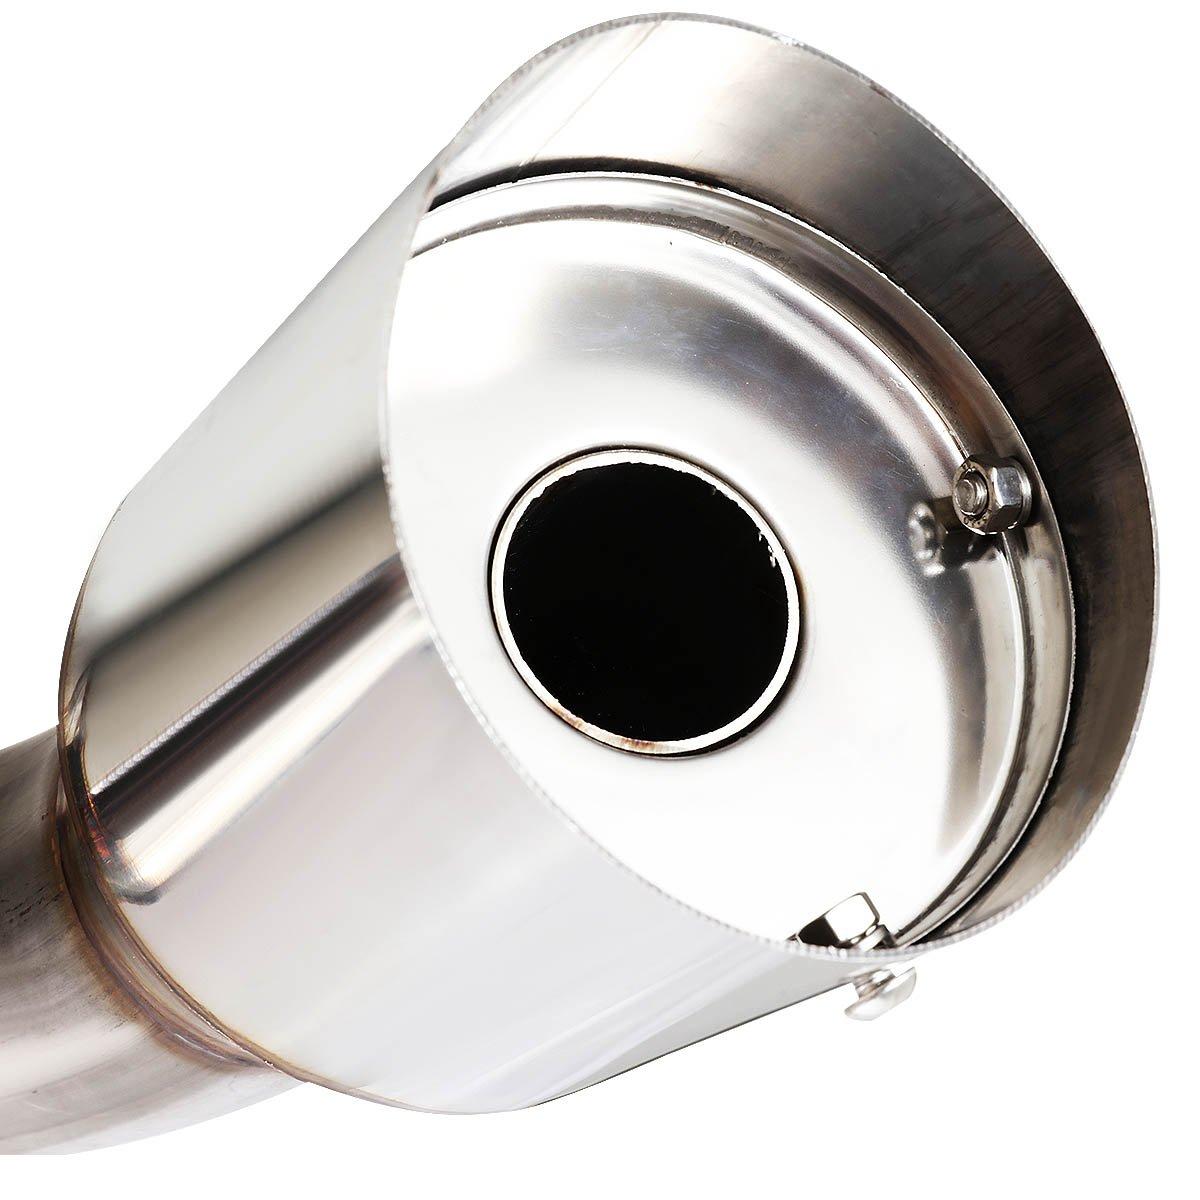 for 10-13 MazdaSpeed-3 2.3L Turbo DNA Motoring CBE-MZ3-T CBEMZ3T Catback Exhaust System